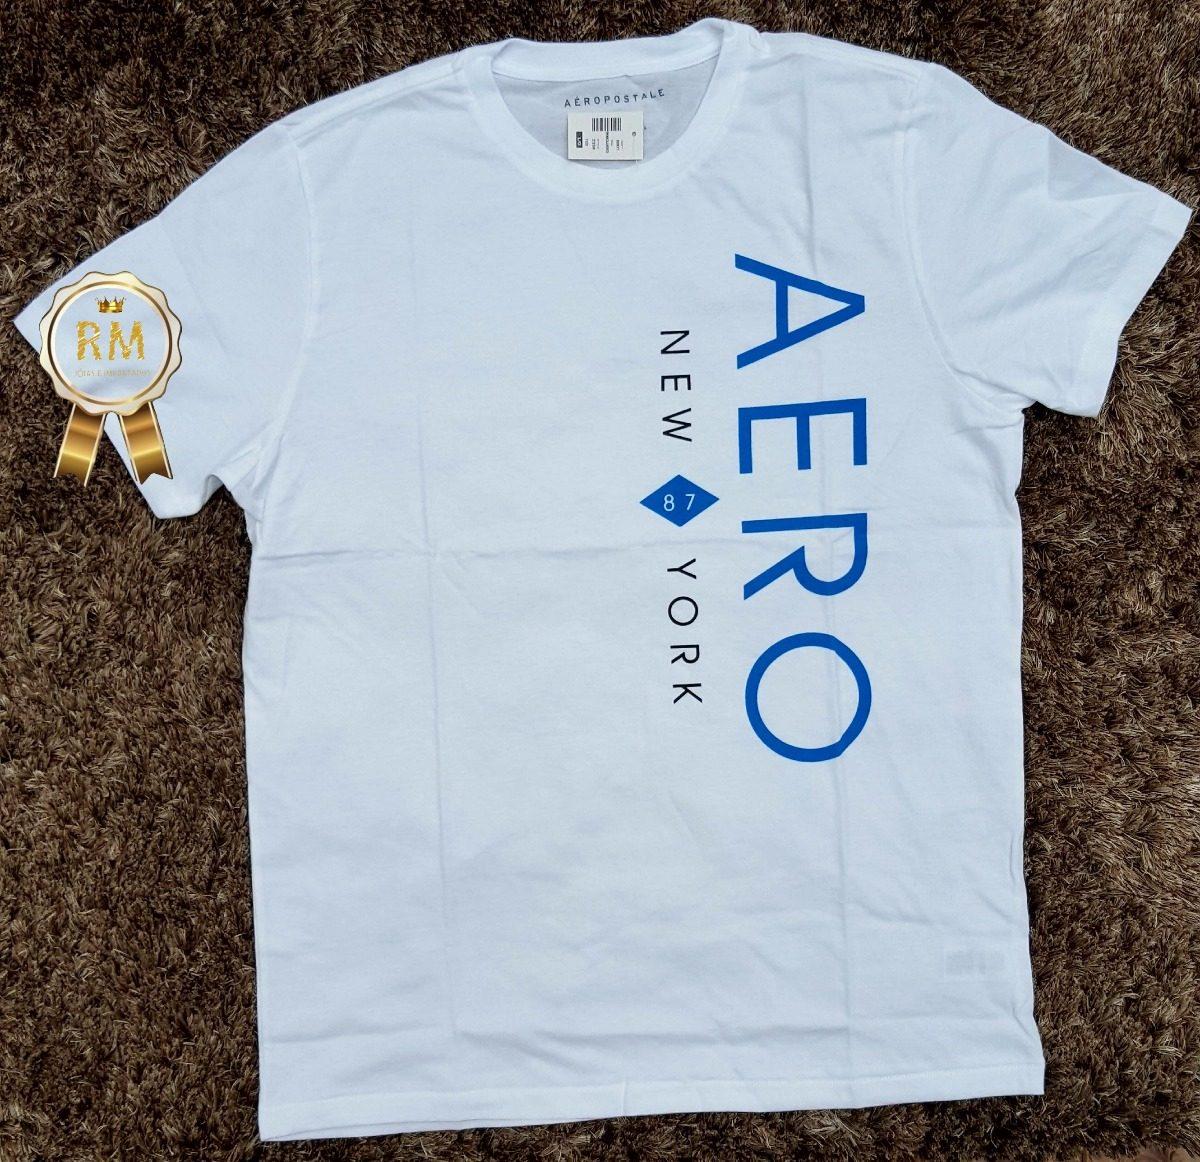 0f1098a005d586  camiseta blusas aeropostale 100% original pronta entrega.  Carregando zoom. 69ecabb39fe79